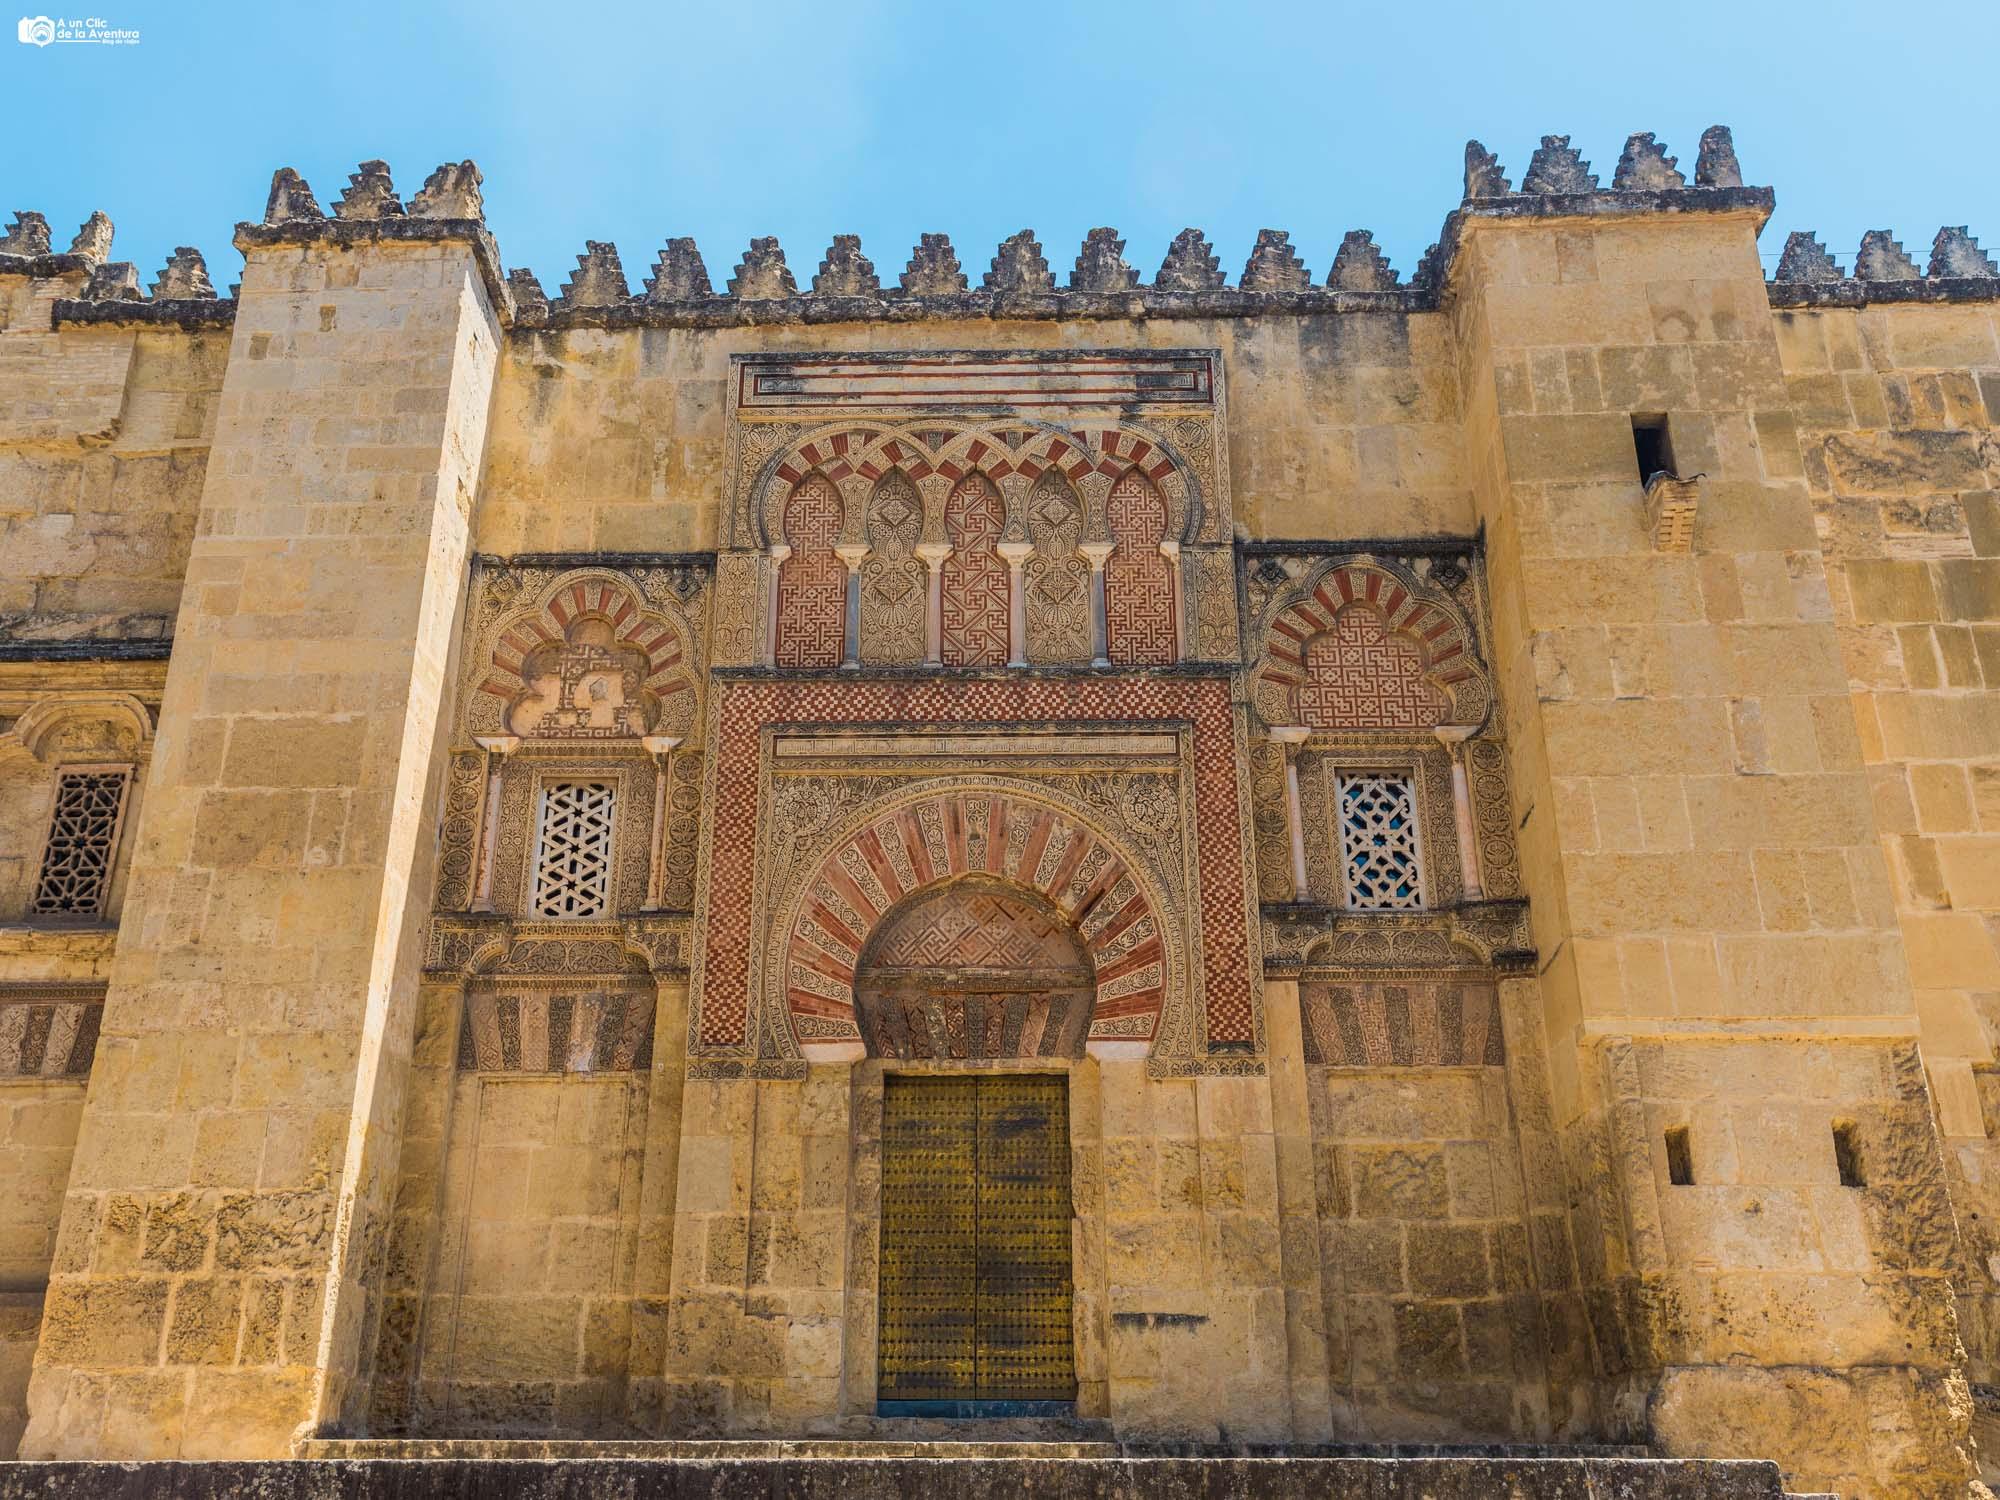 Puerta de San Ildefonso de la Mezquita de Córdoba